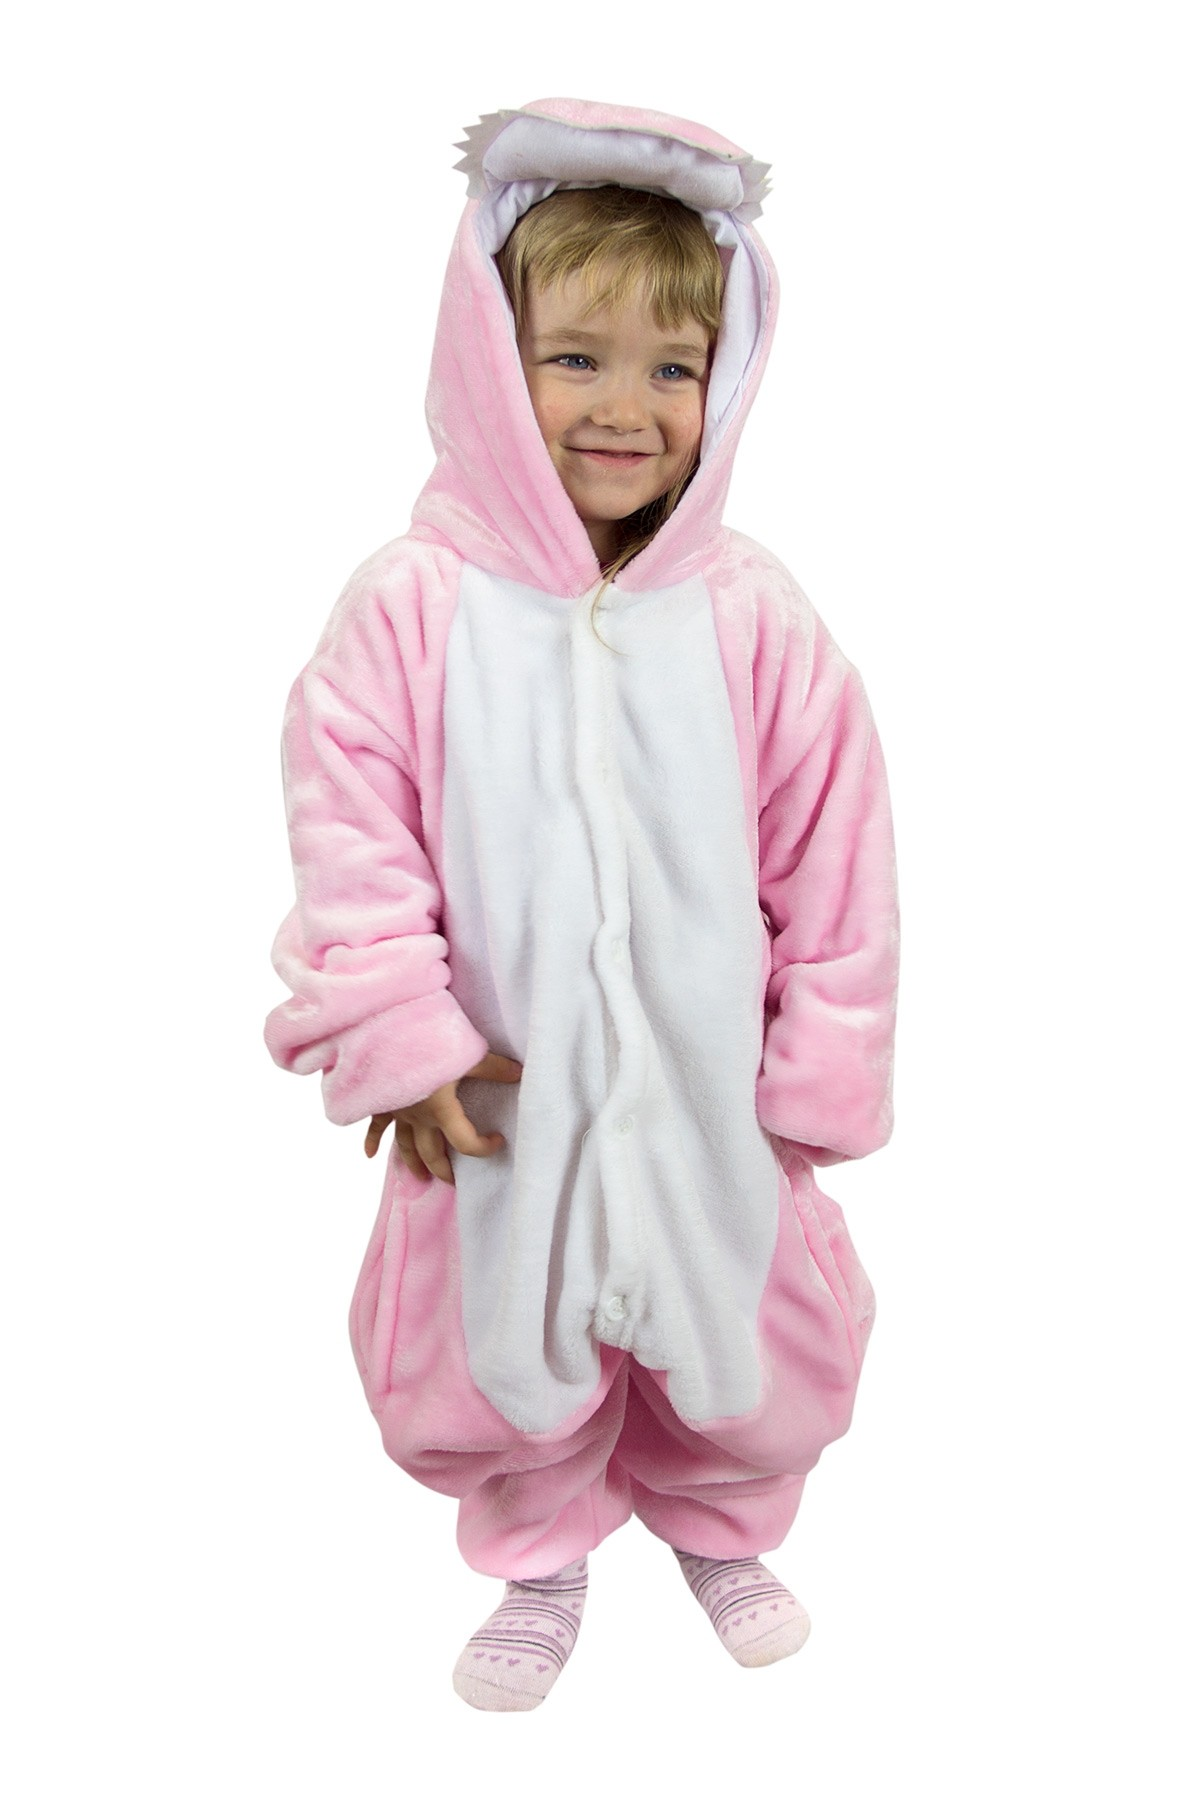 Детская пижама-кигуруми Дракоша (26) детская пижама кигуруми хрюшка 26